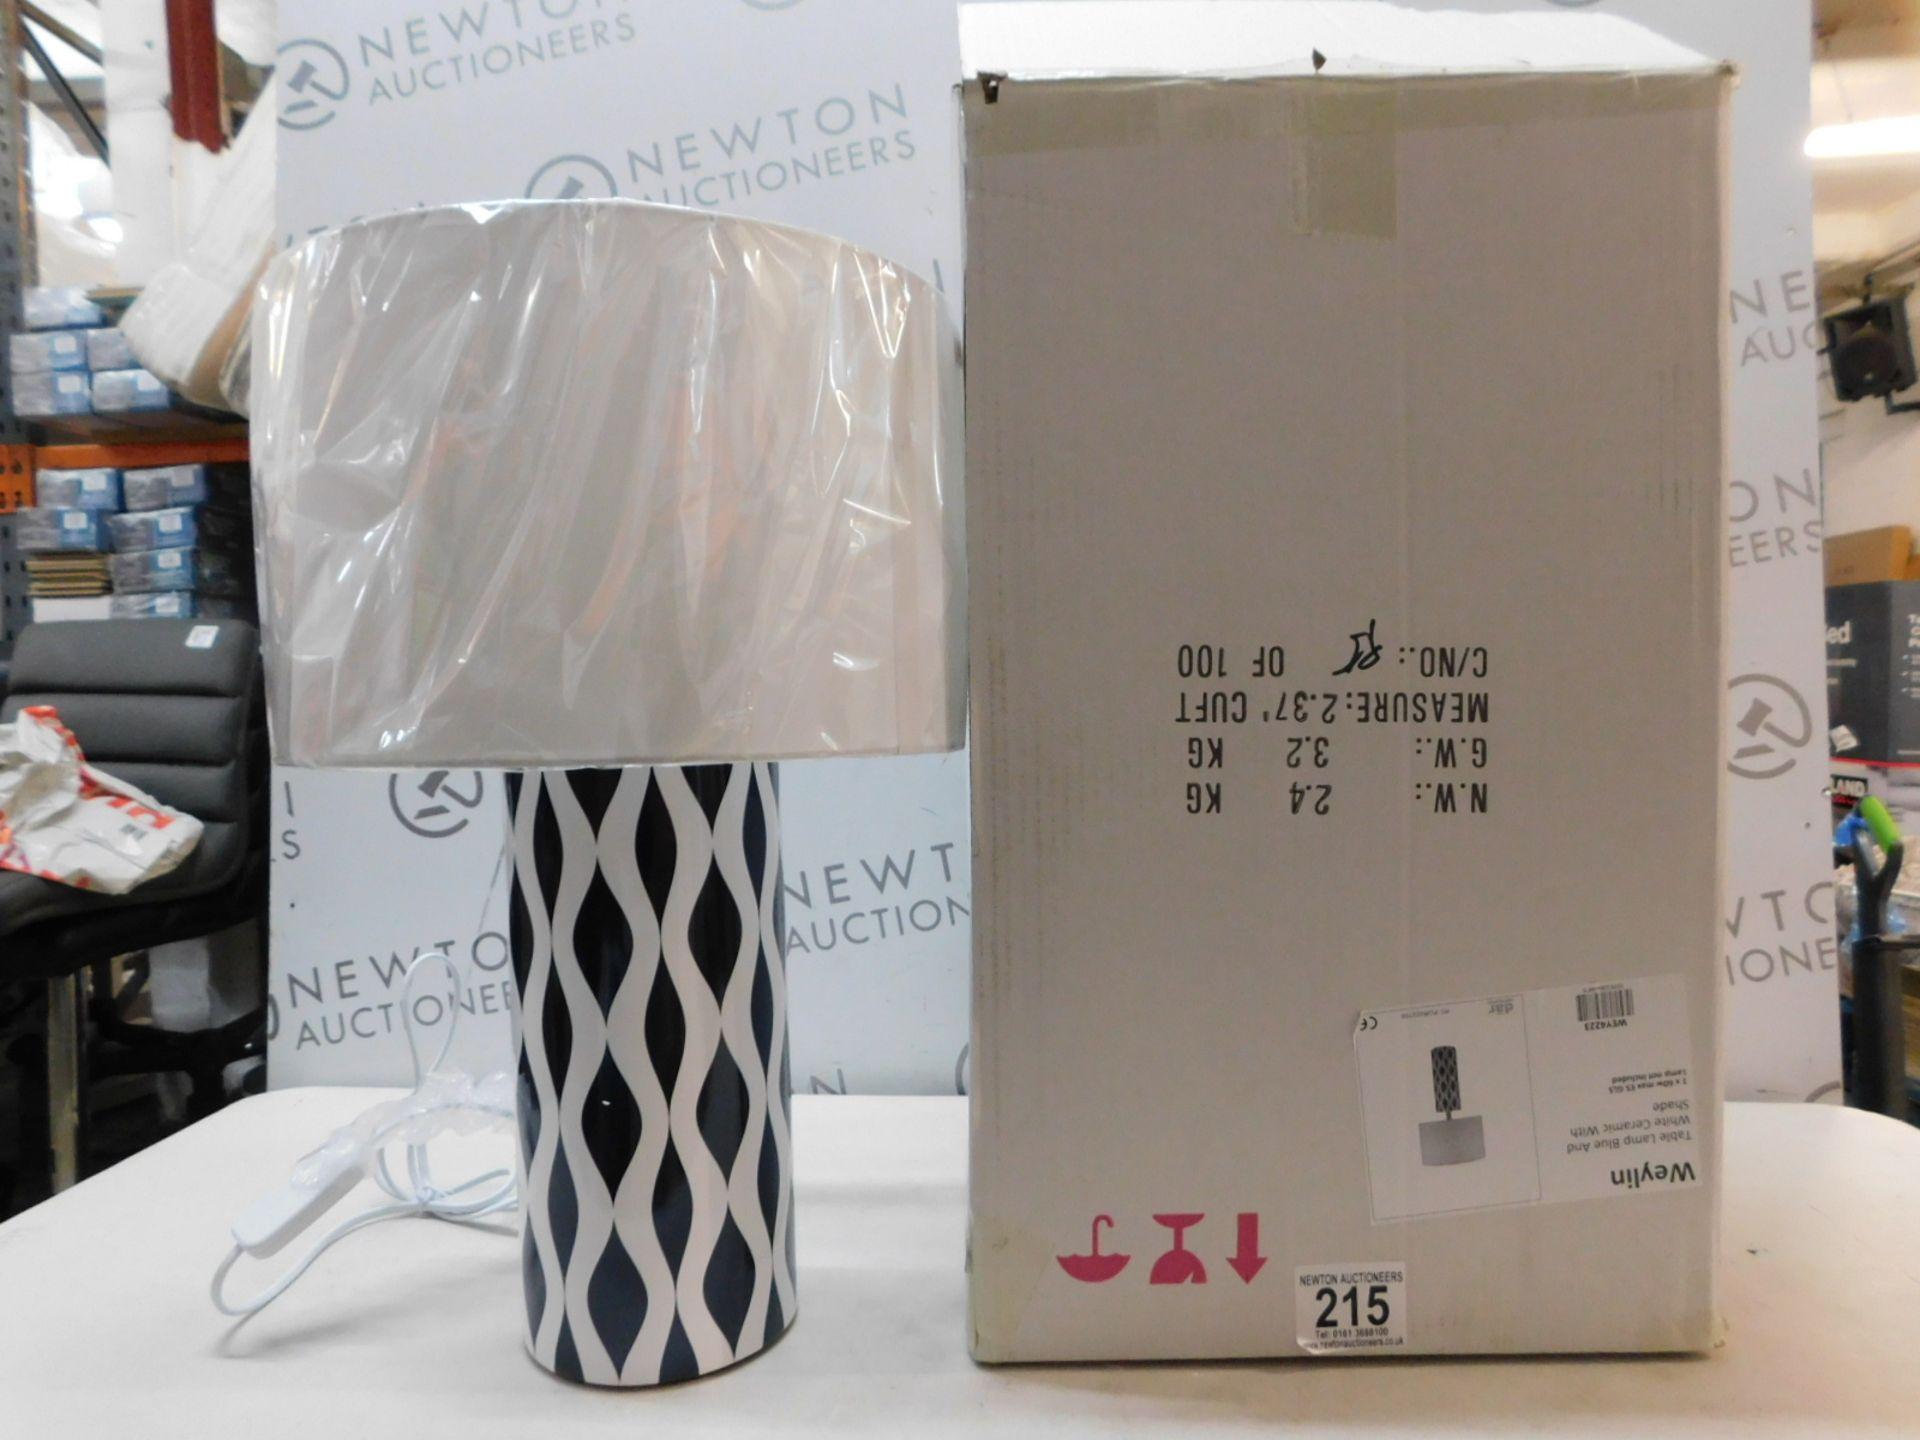 1 BOXED WEYLIN CERAMIC TABLE LAMP [H 56 X W 32CM] RRP £69